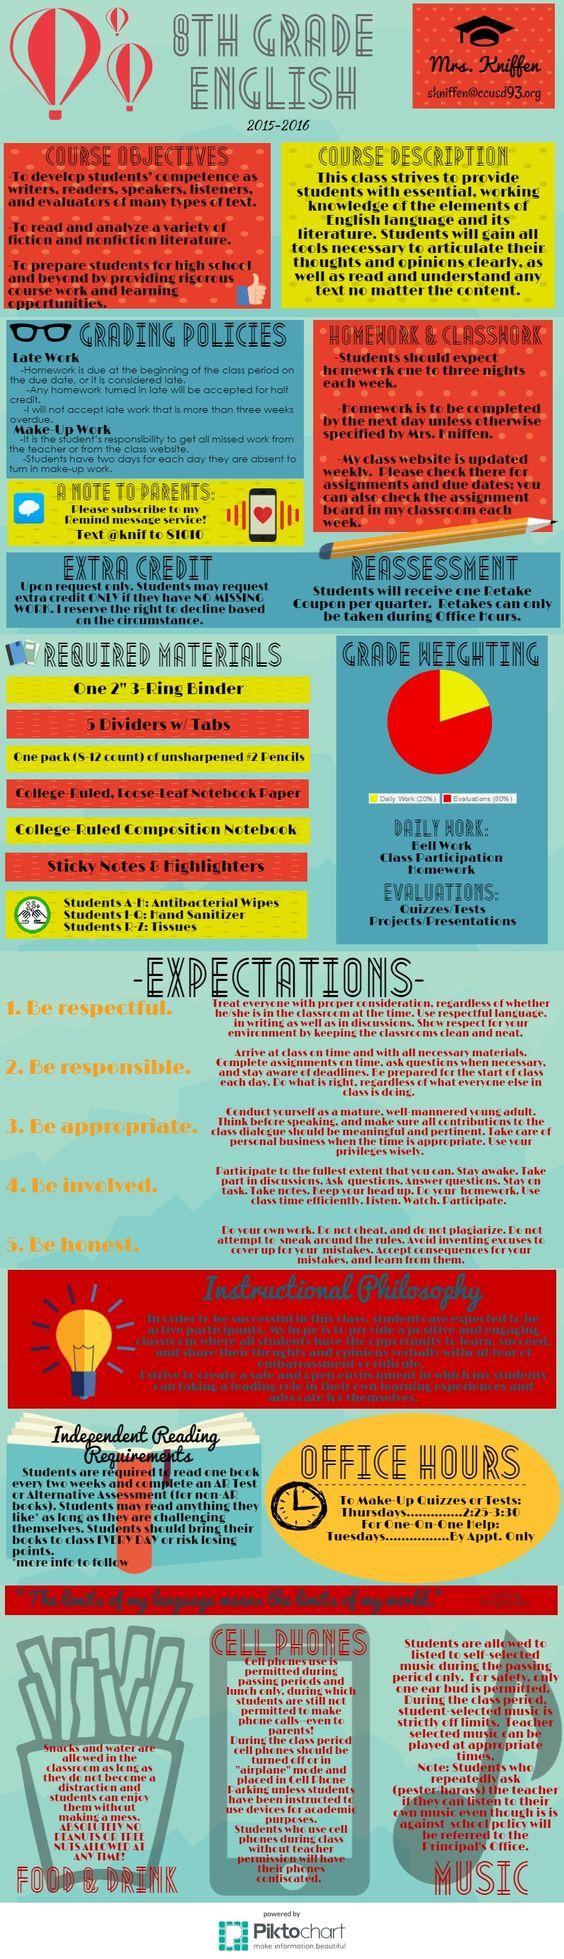 2015-2016 Class Syllabus   Piktochart Infographic Editor More